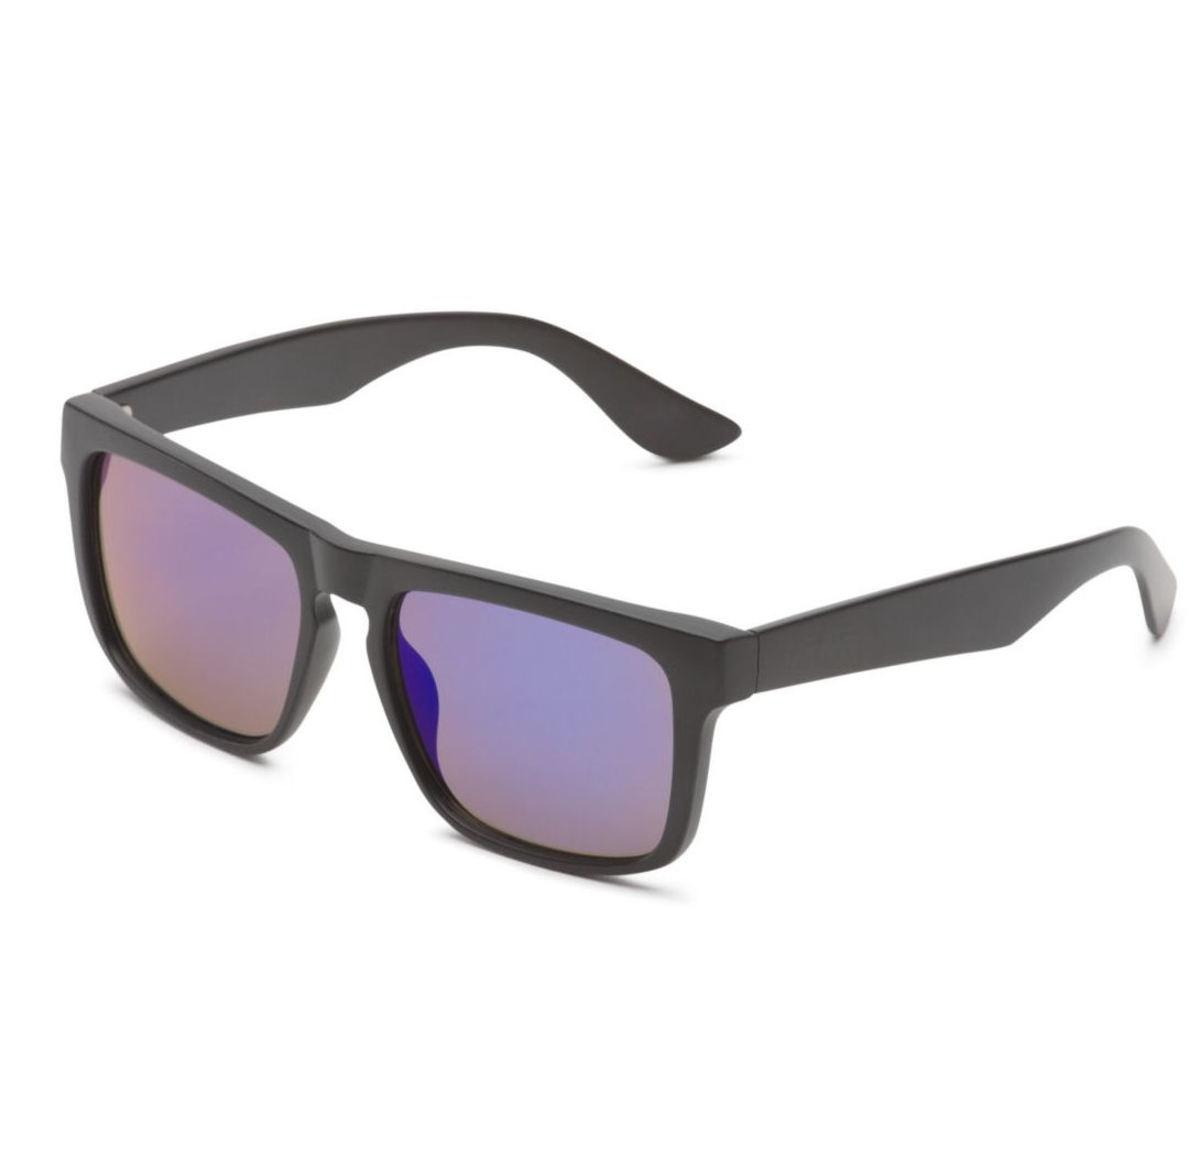 14b06e92a okuliare slnečné VANS - MN SQUARED OFF MATTE - BLACK / RYL ...